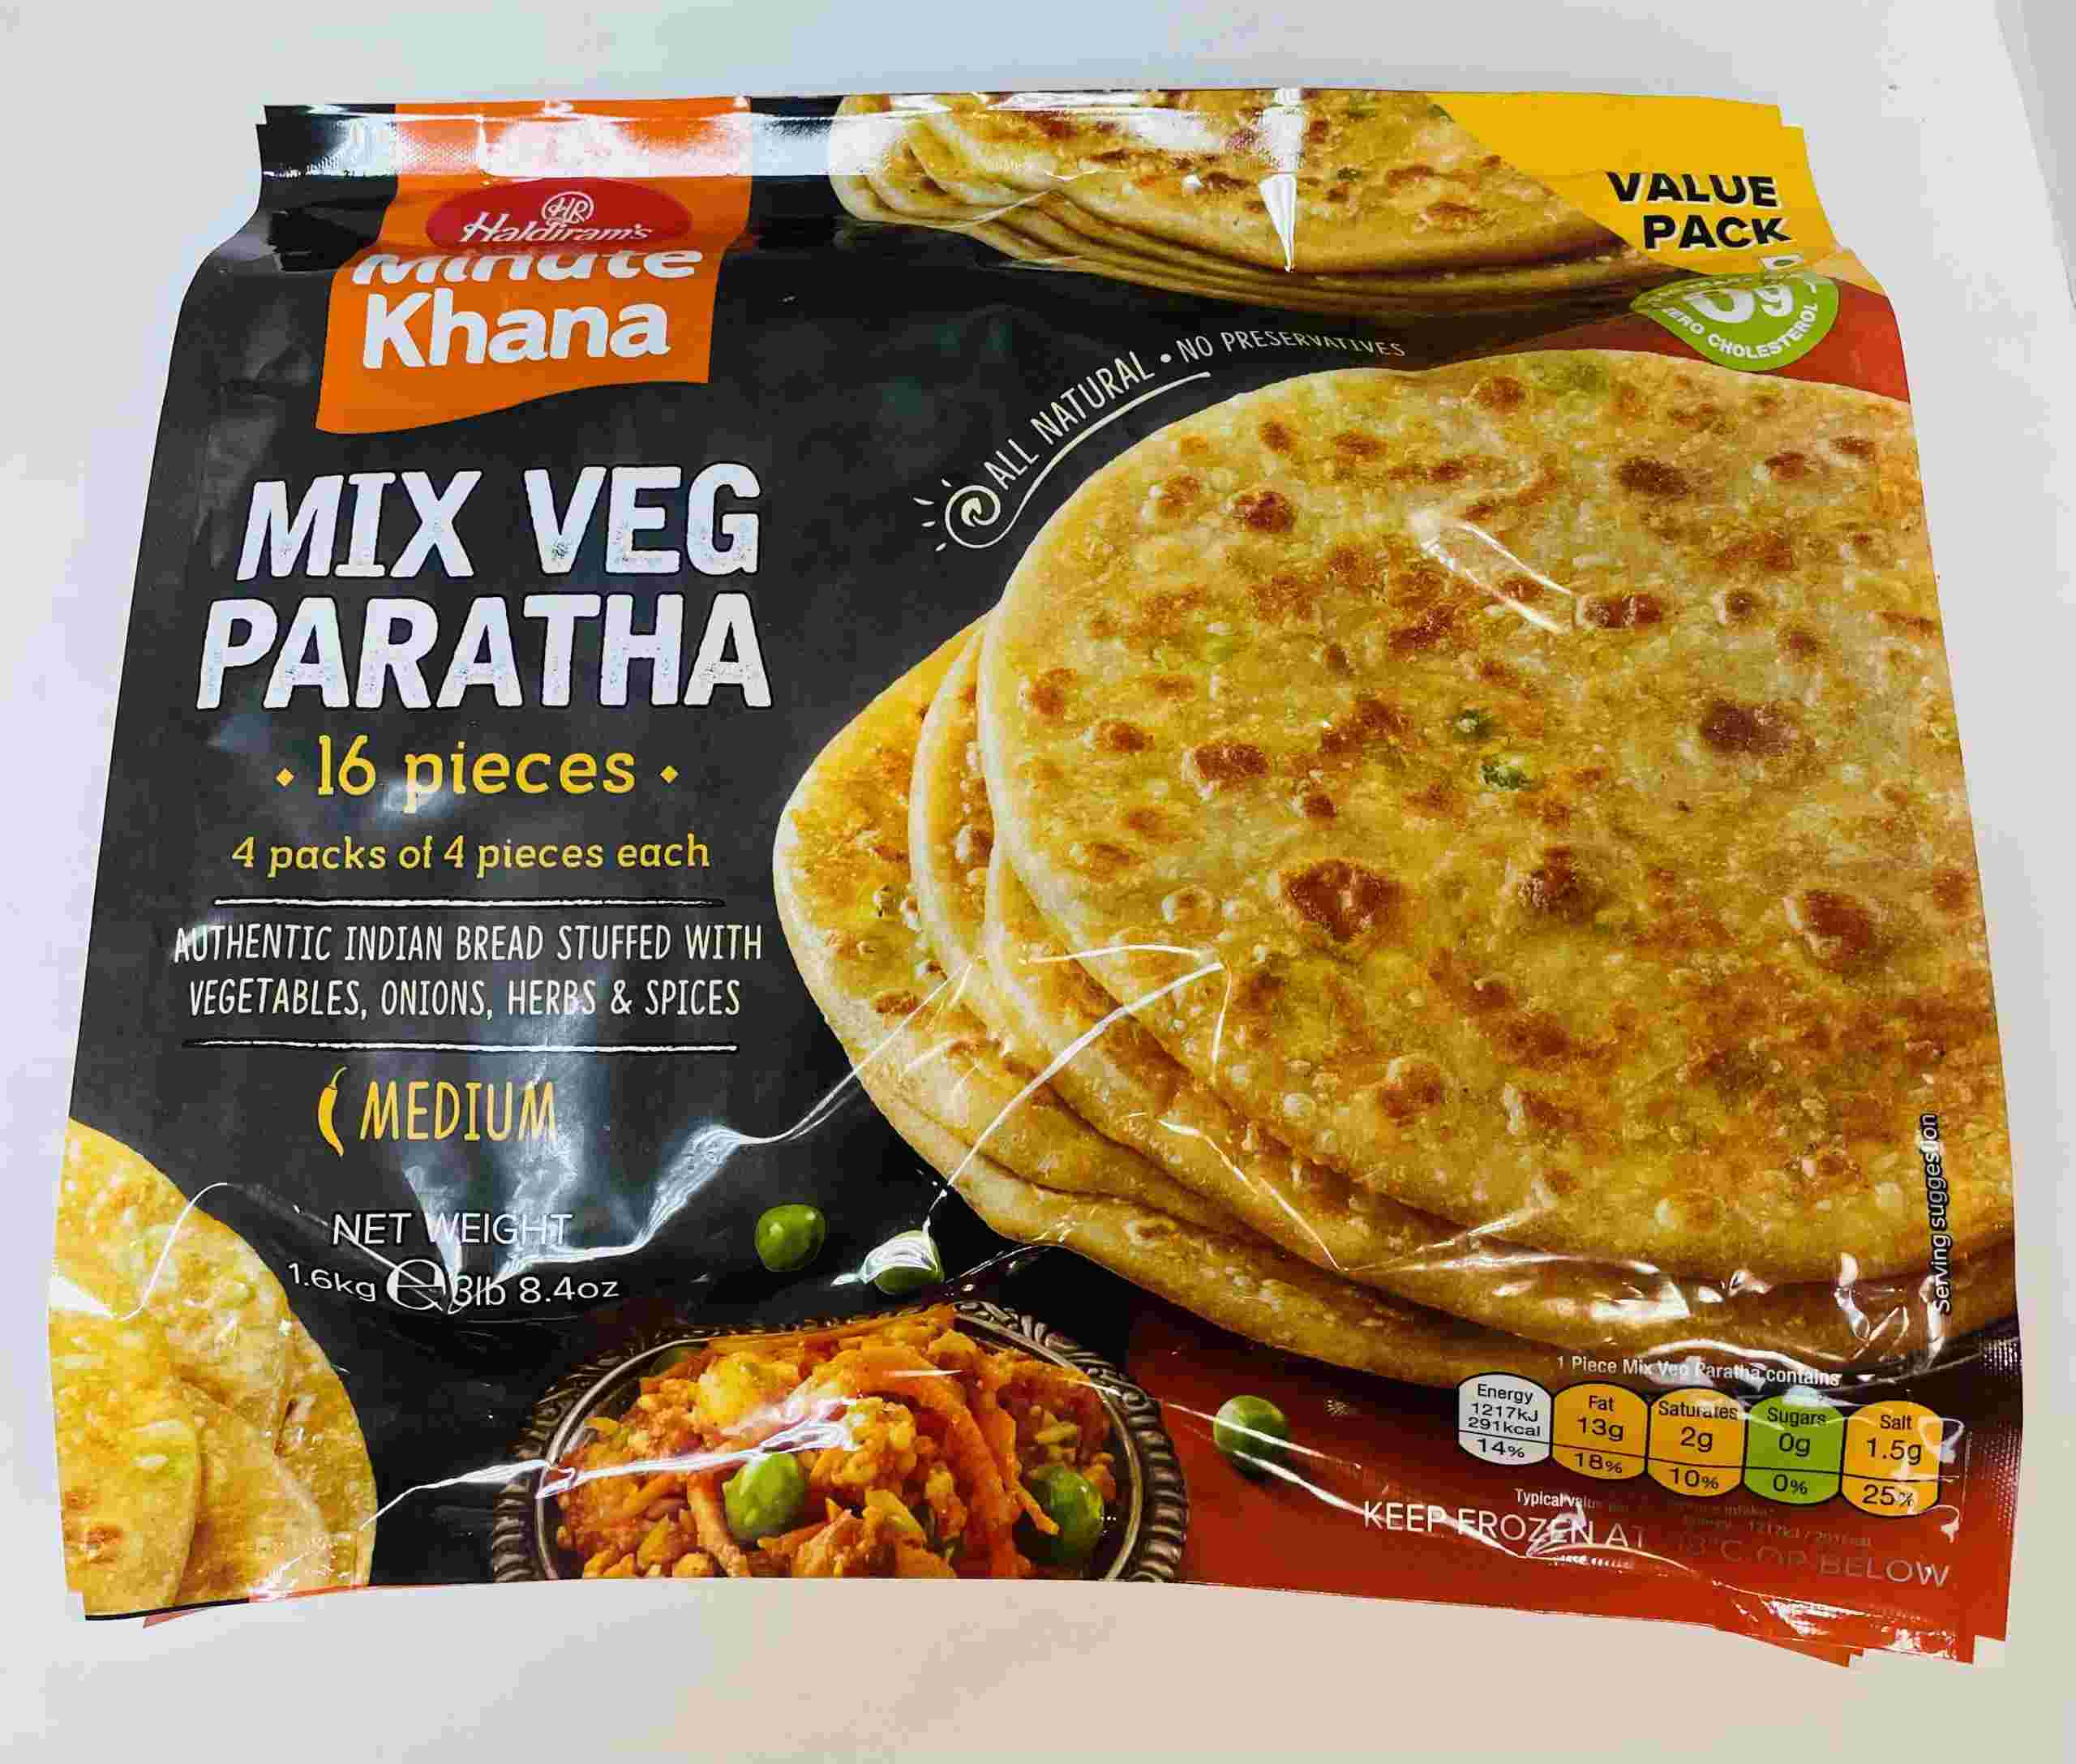 Haldiram's Mix Veg Paratha 16 Pieces